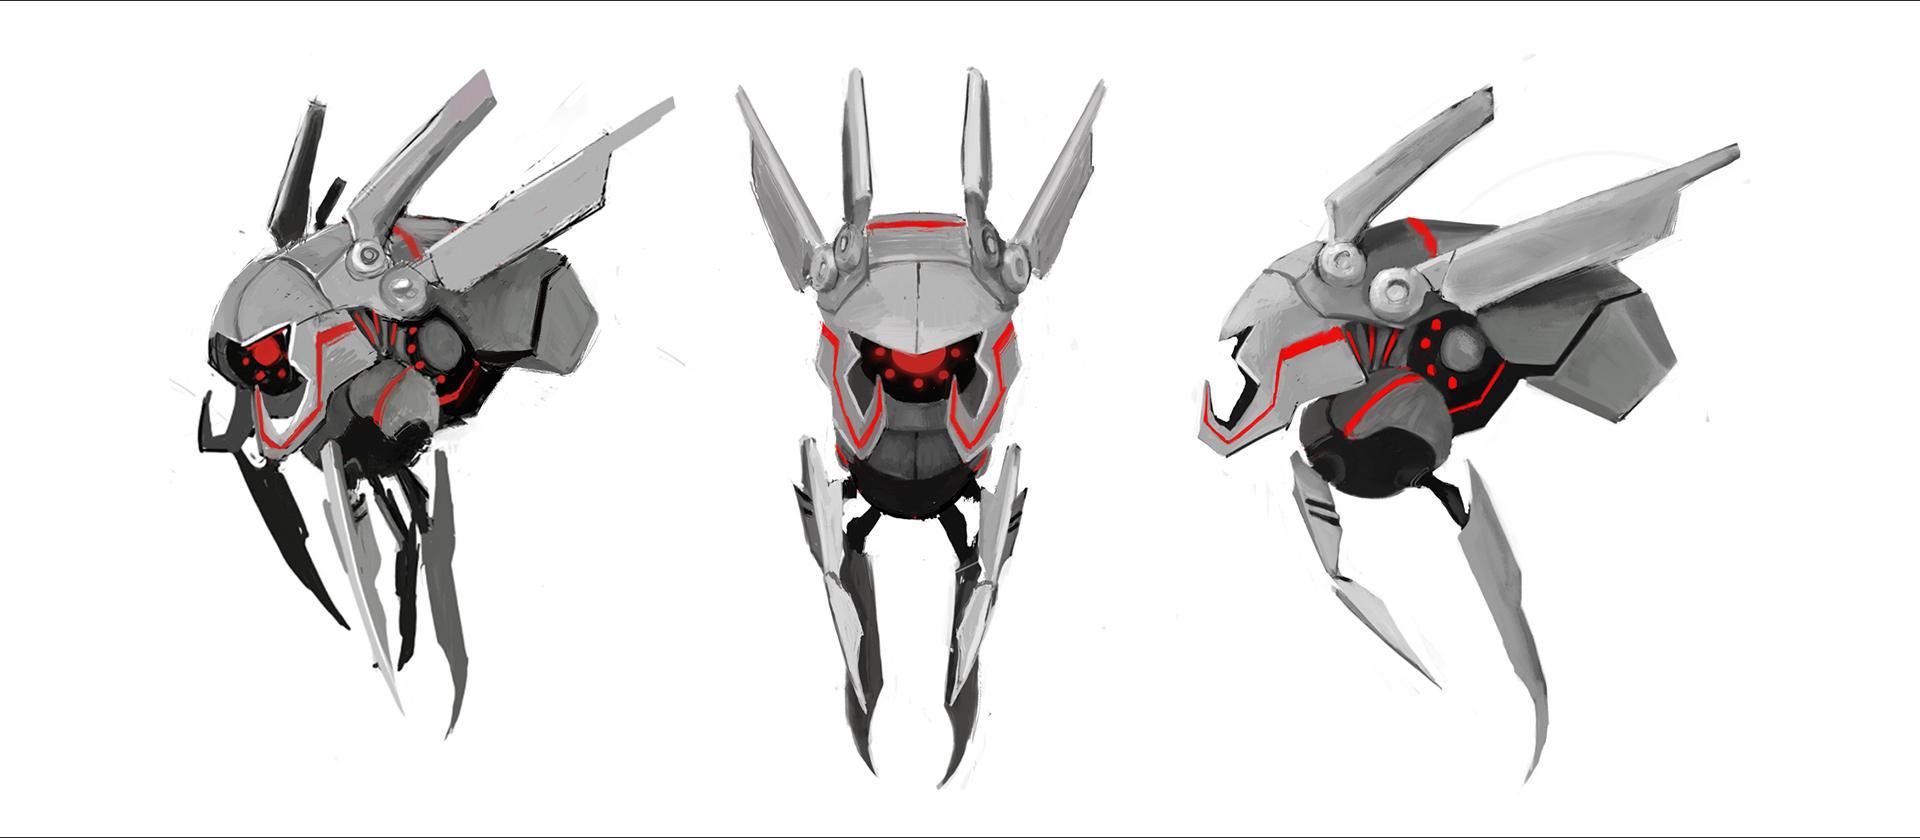 Drone Concept Image